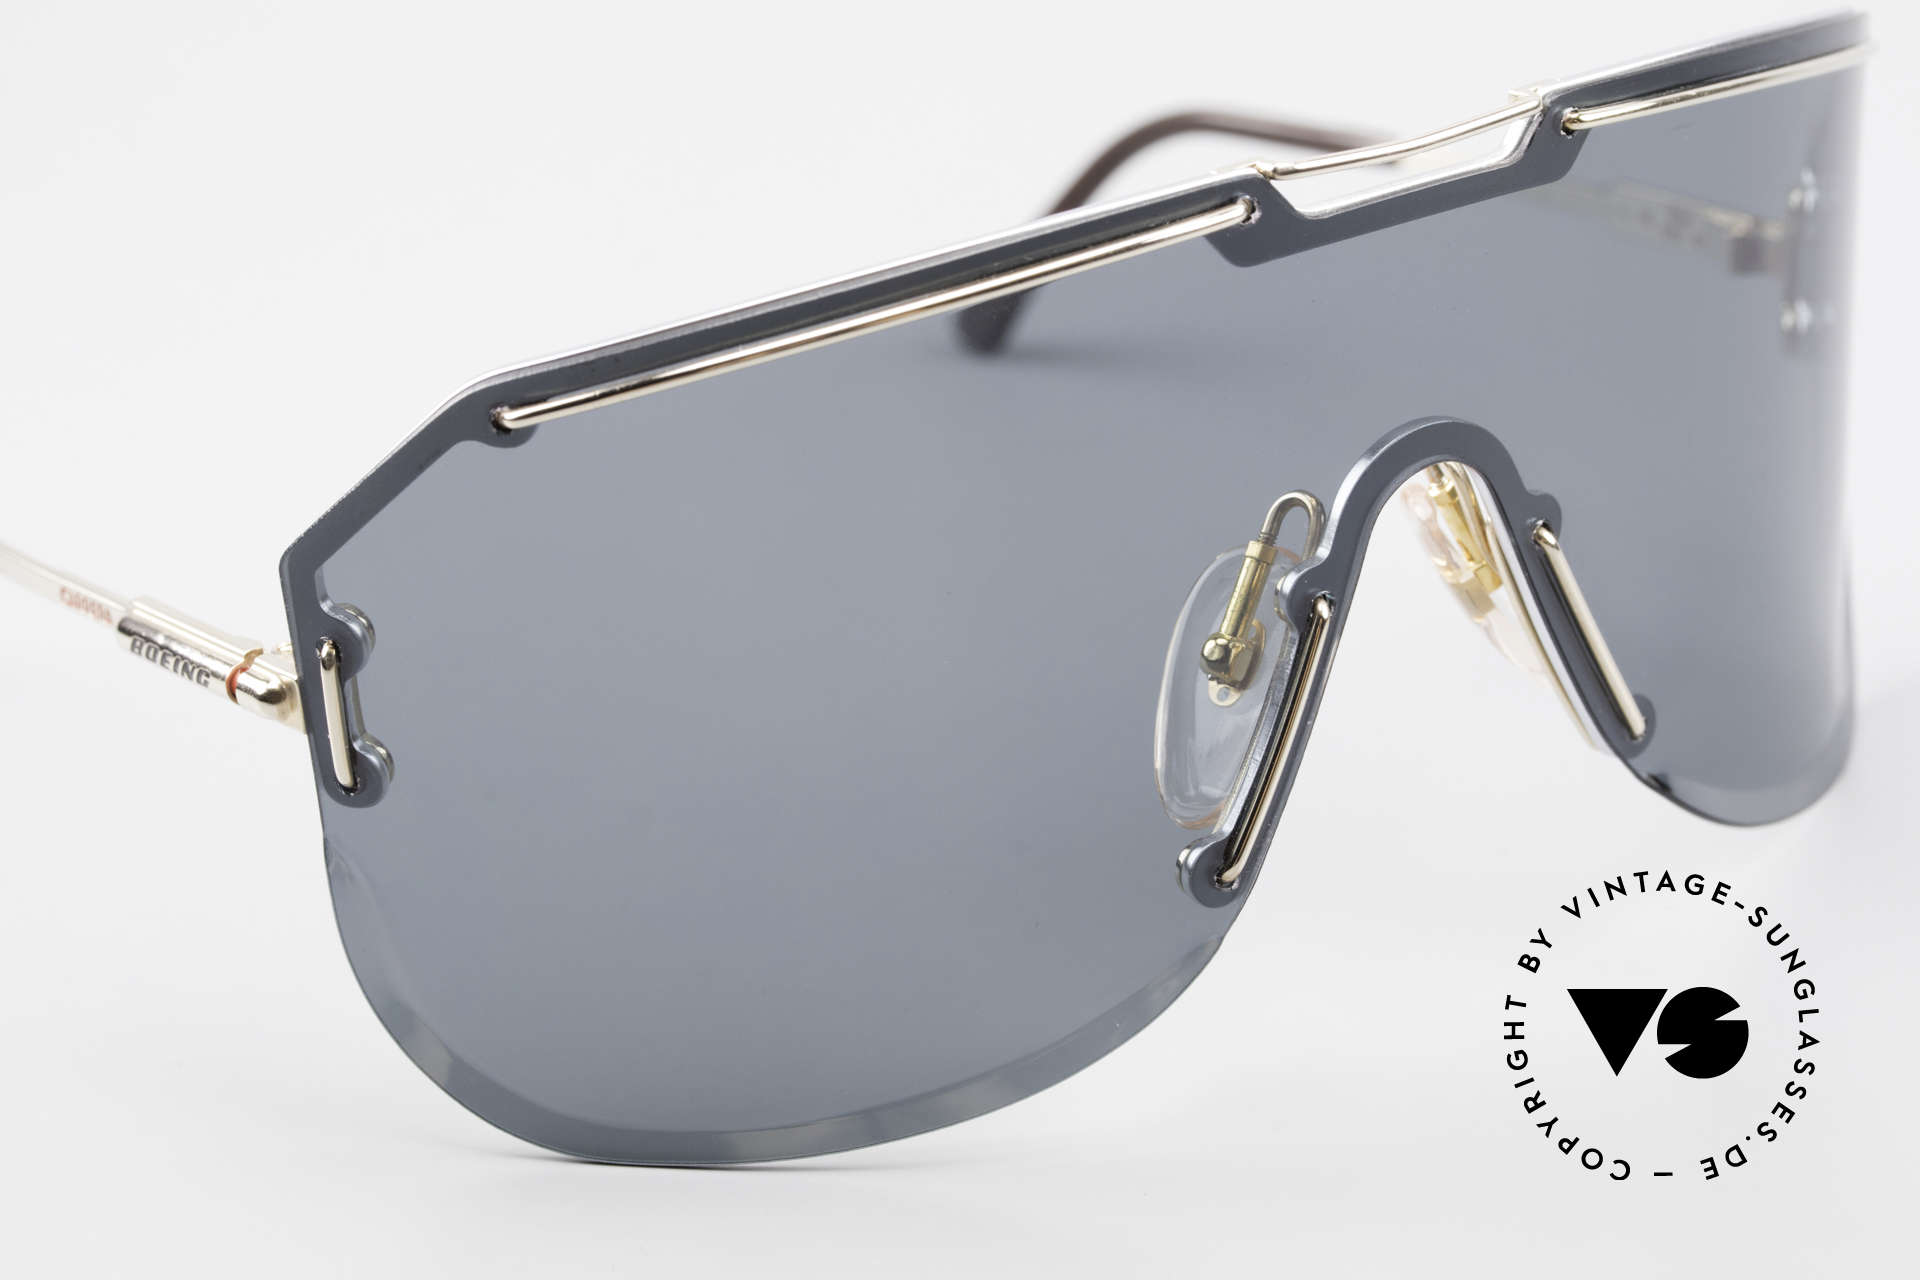 Boeing 5703 80's Luxury Pilots Sunglasses, he also created the Porsche 5620 'Yoko Ono' sunglasses, Made for Men